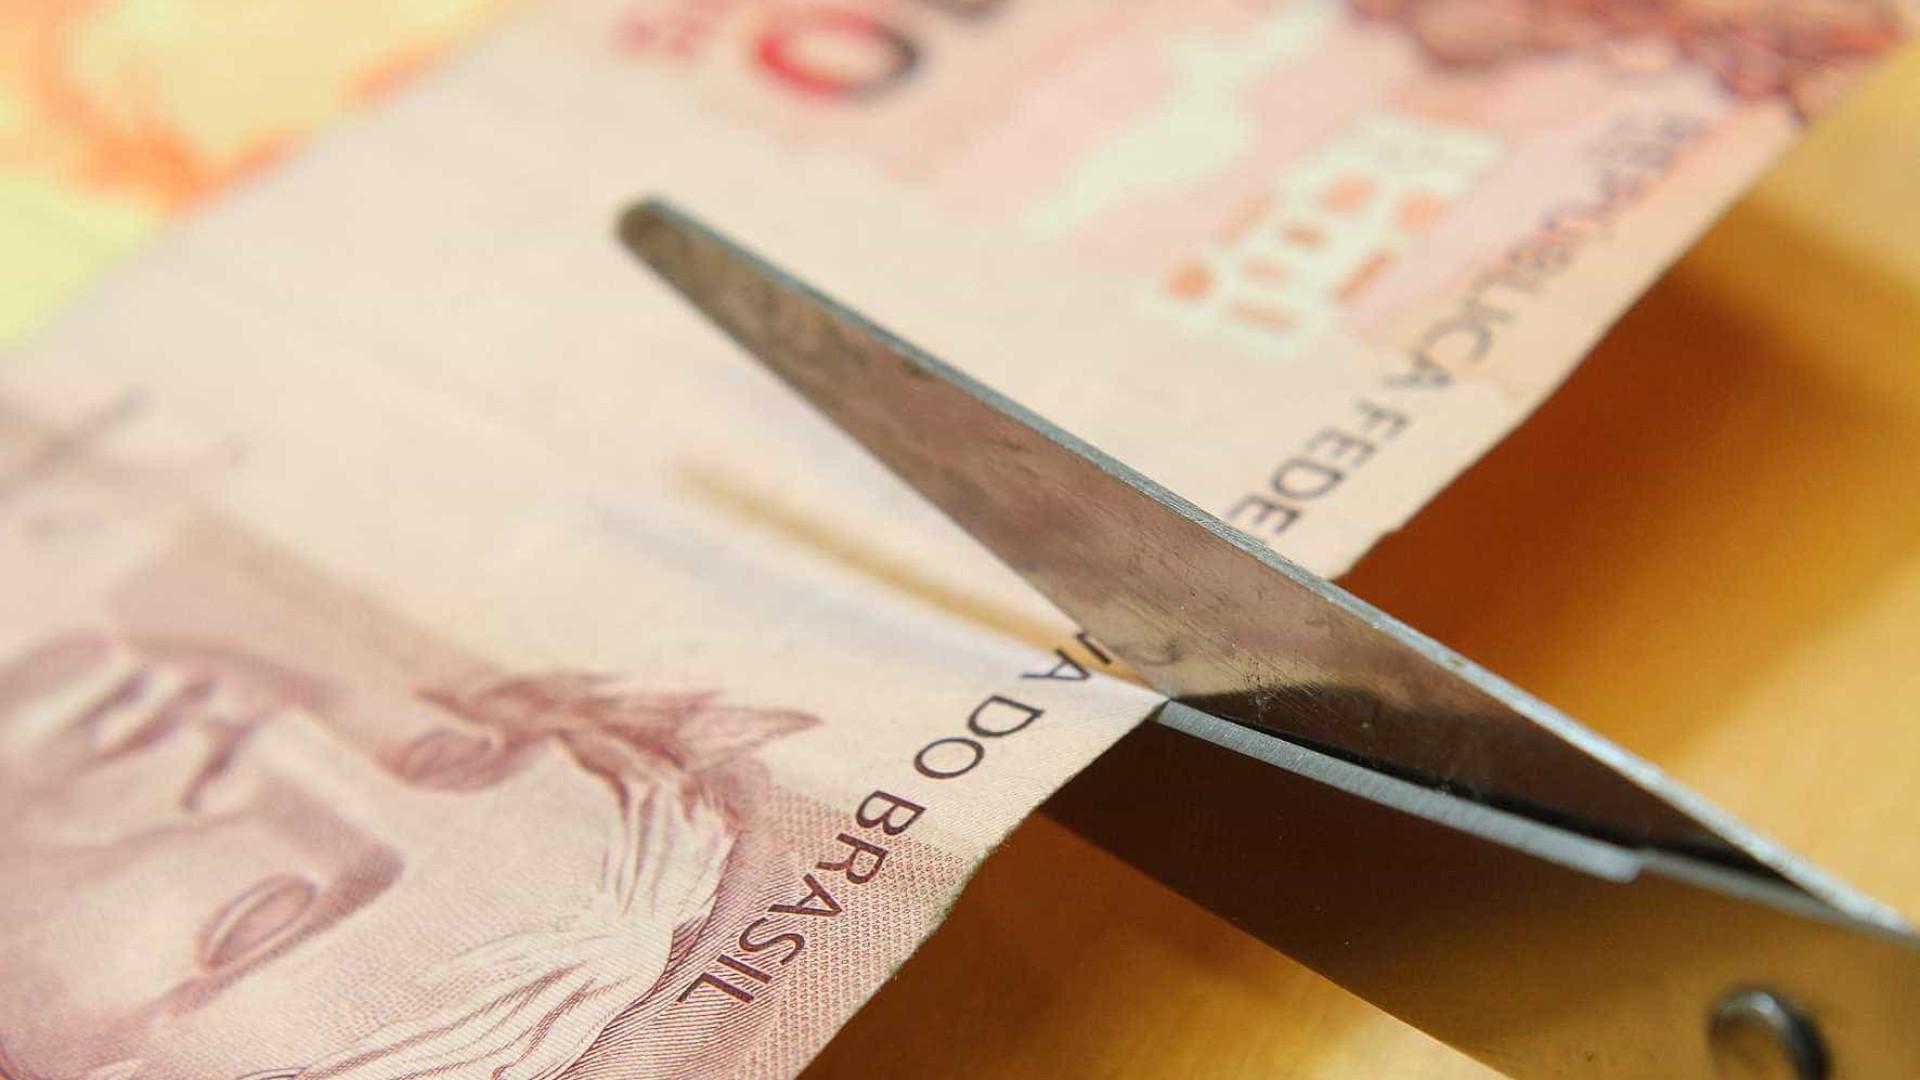 Corte de gastos para alavancar economia é proposta de presidenciáveis